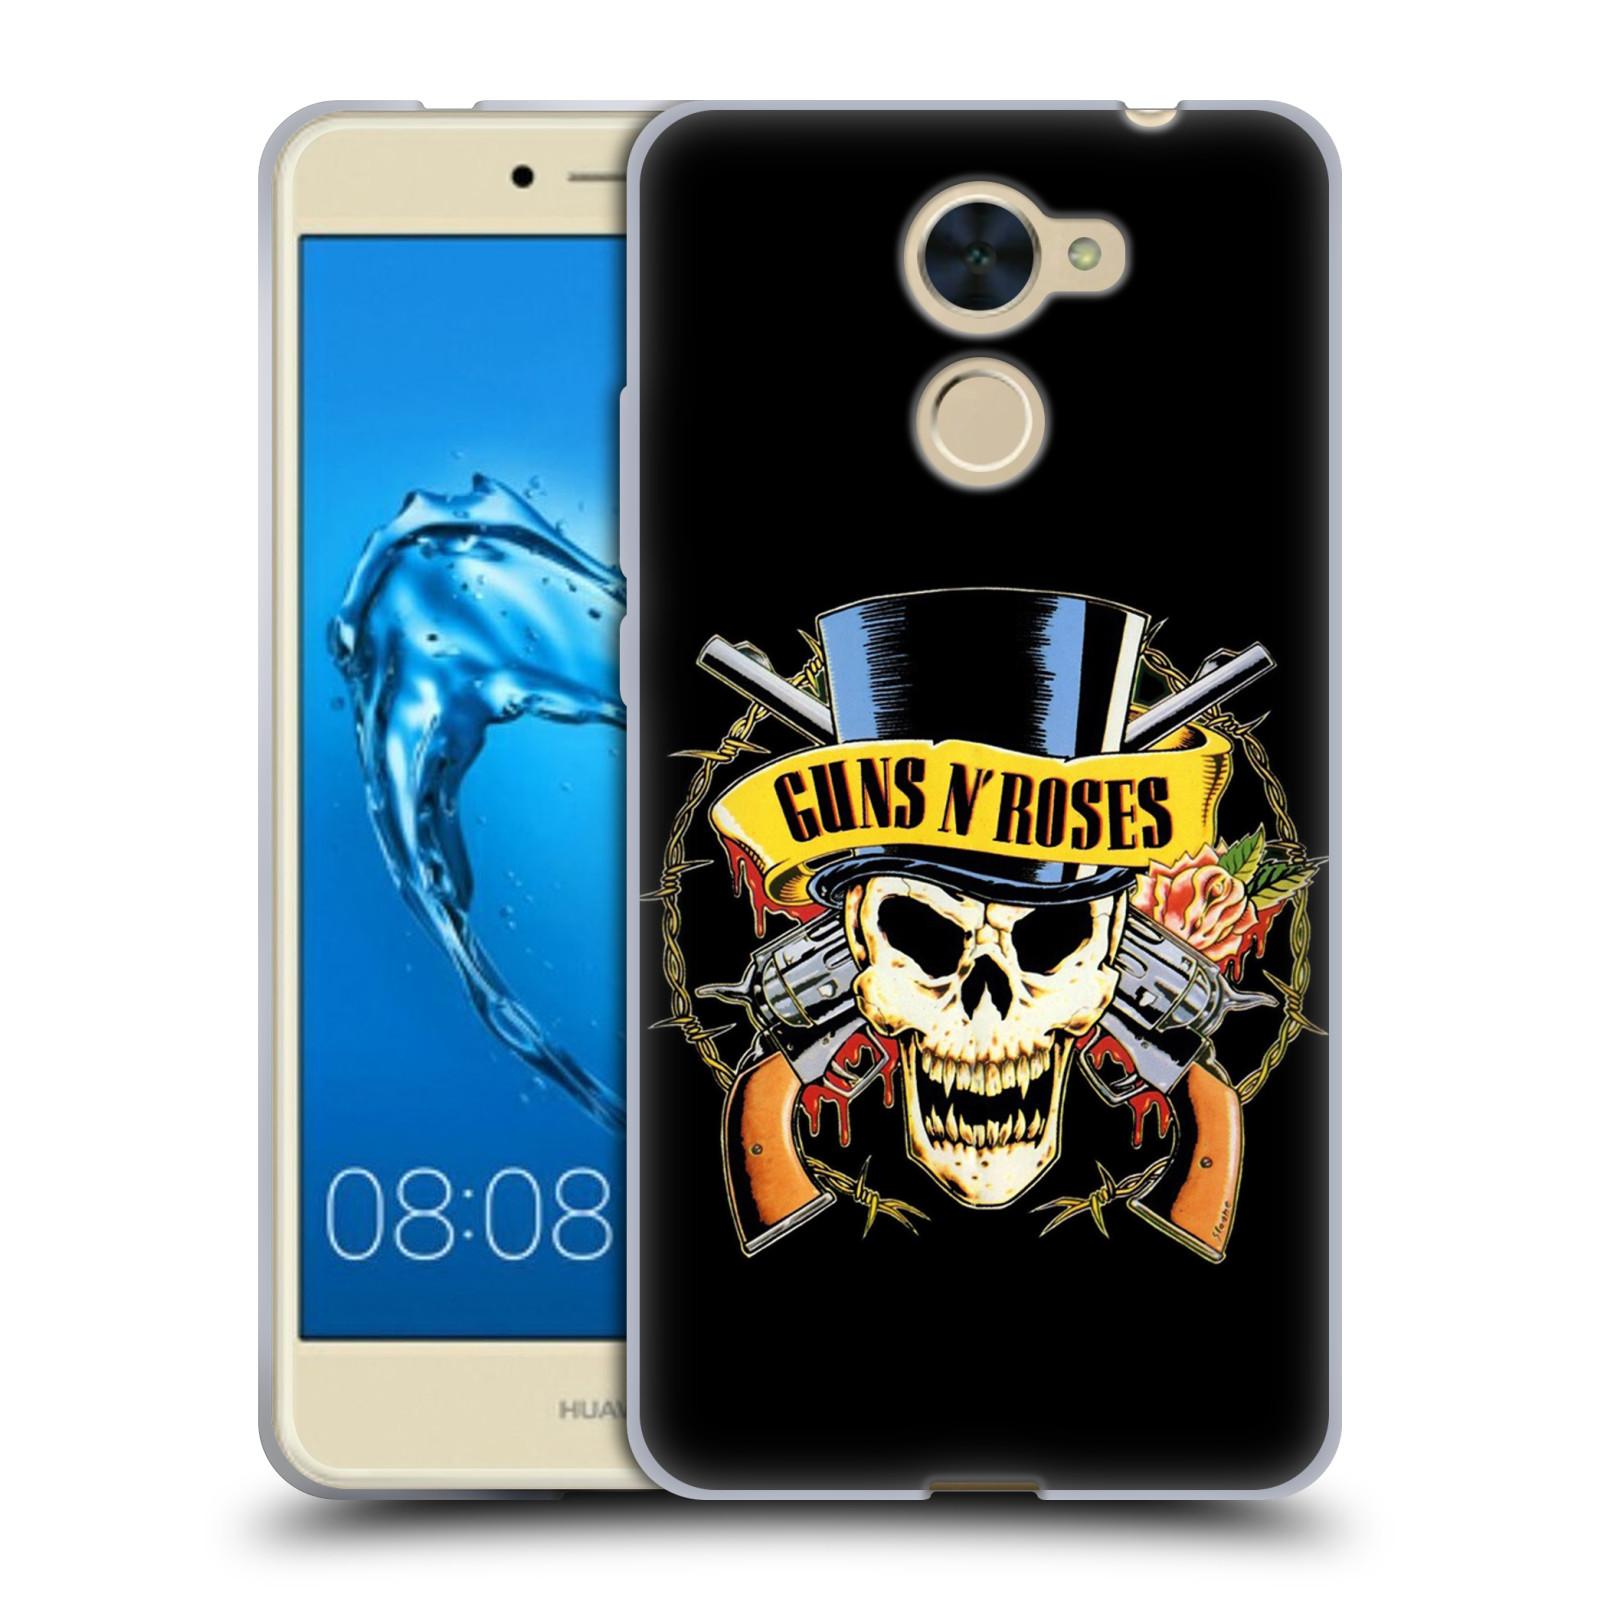 Silikonové pouzdro na mobil Huawei Y7 - Head Case - Guns N' Roses - Lebka